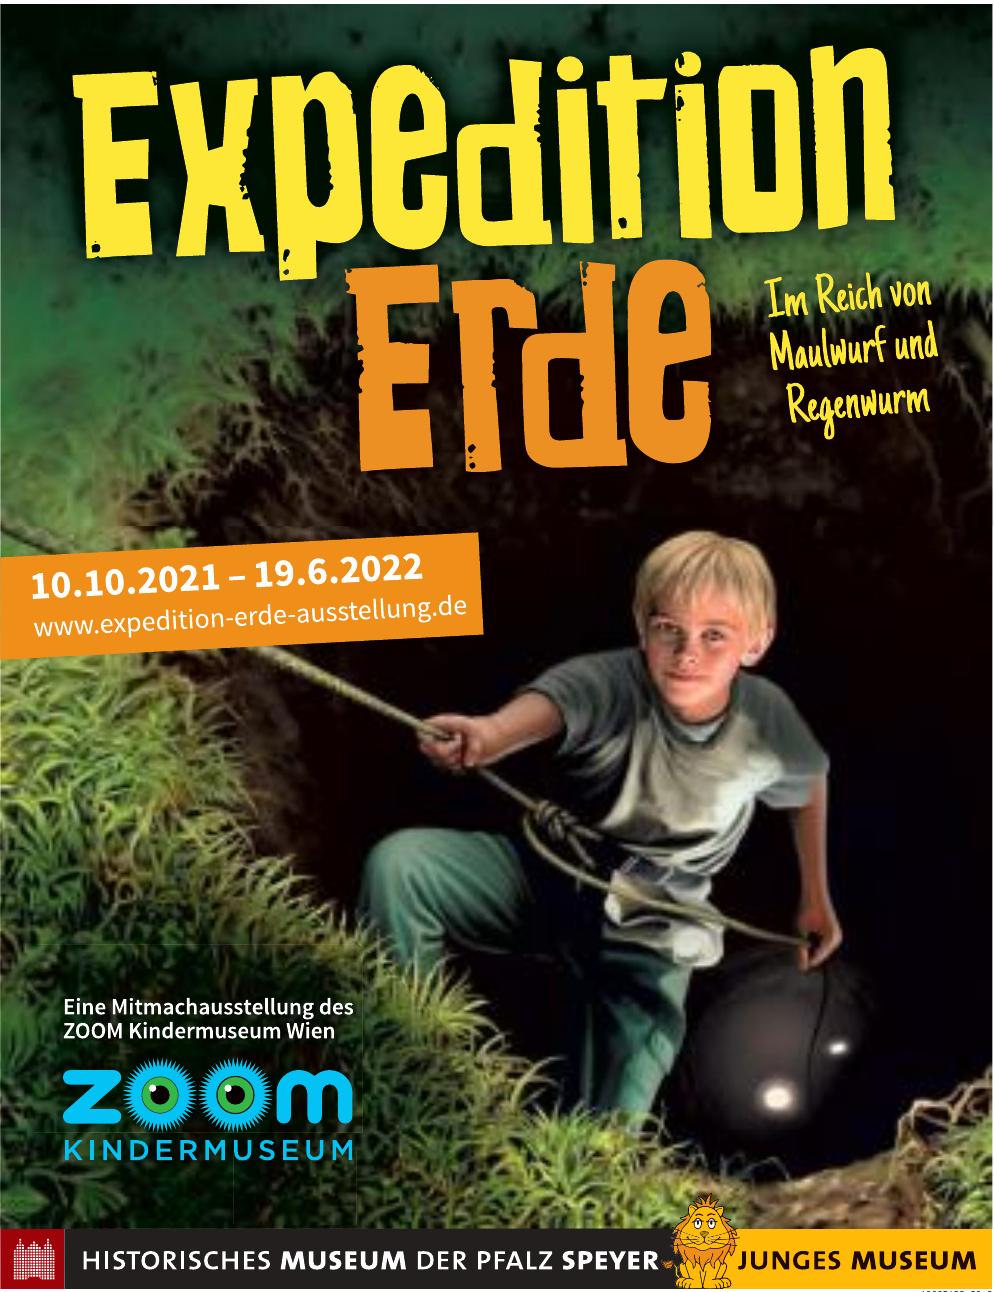 Expededition Erde